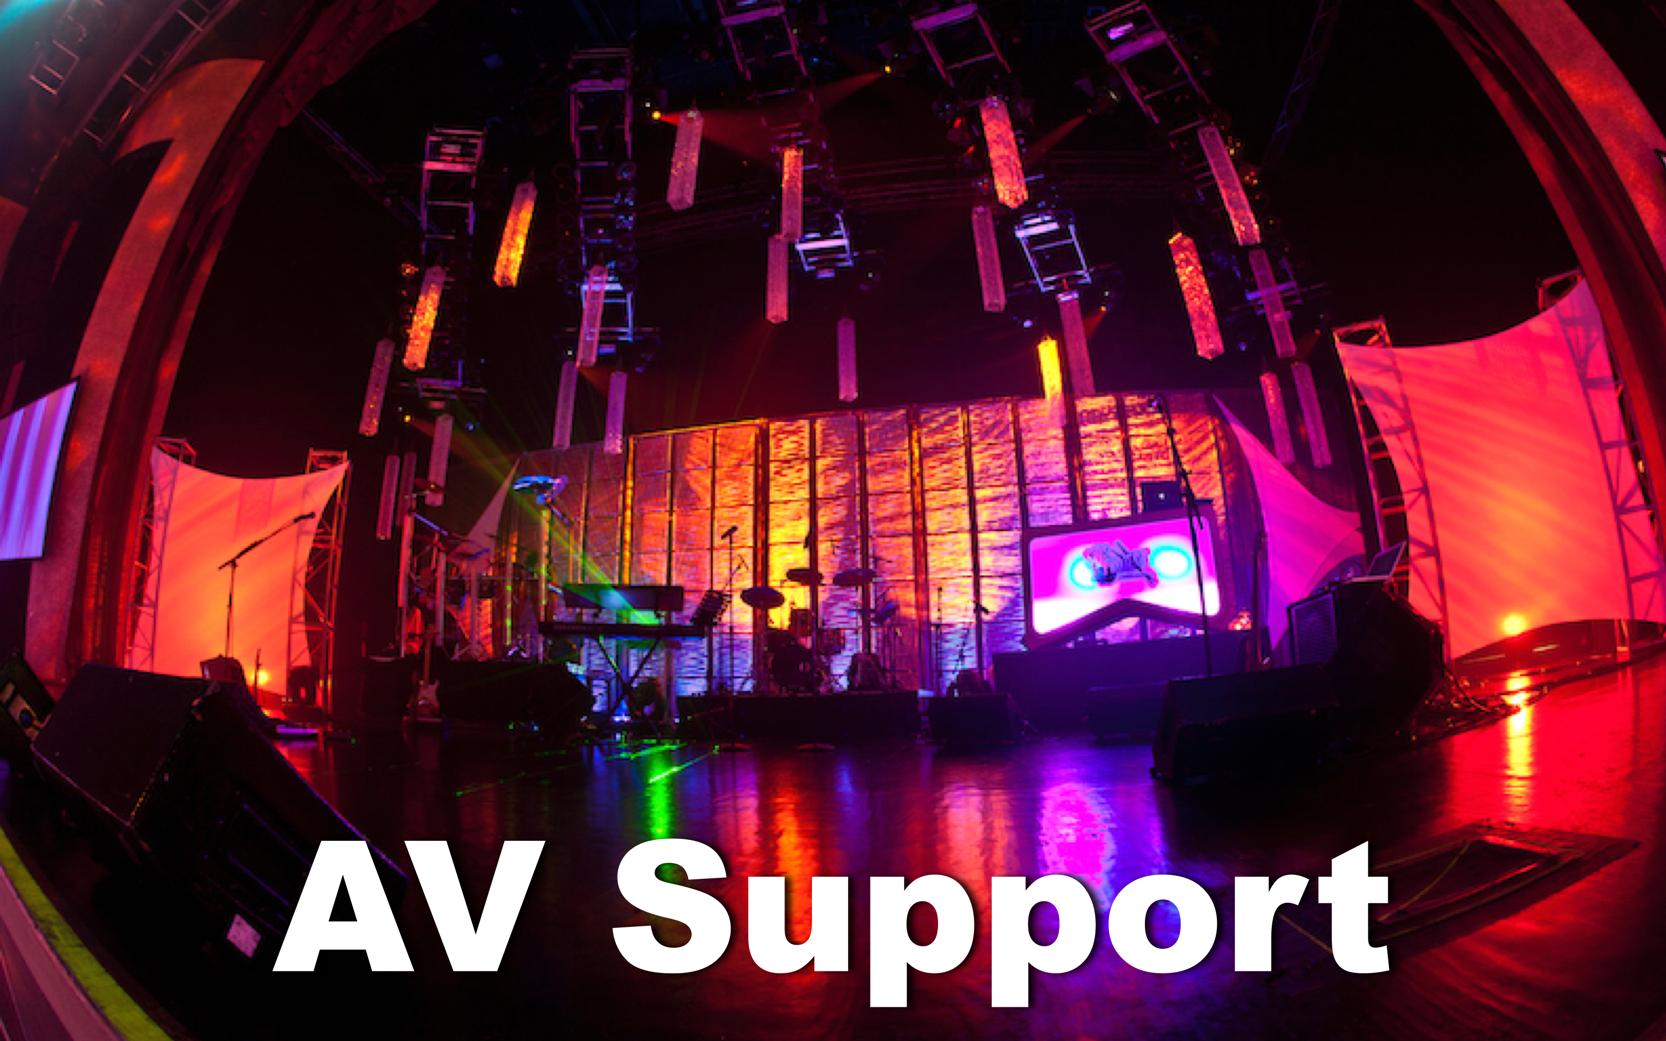 AV SUPPORT